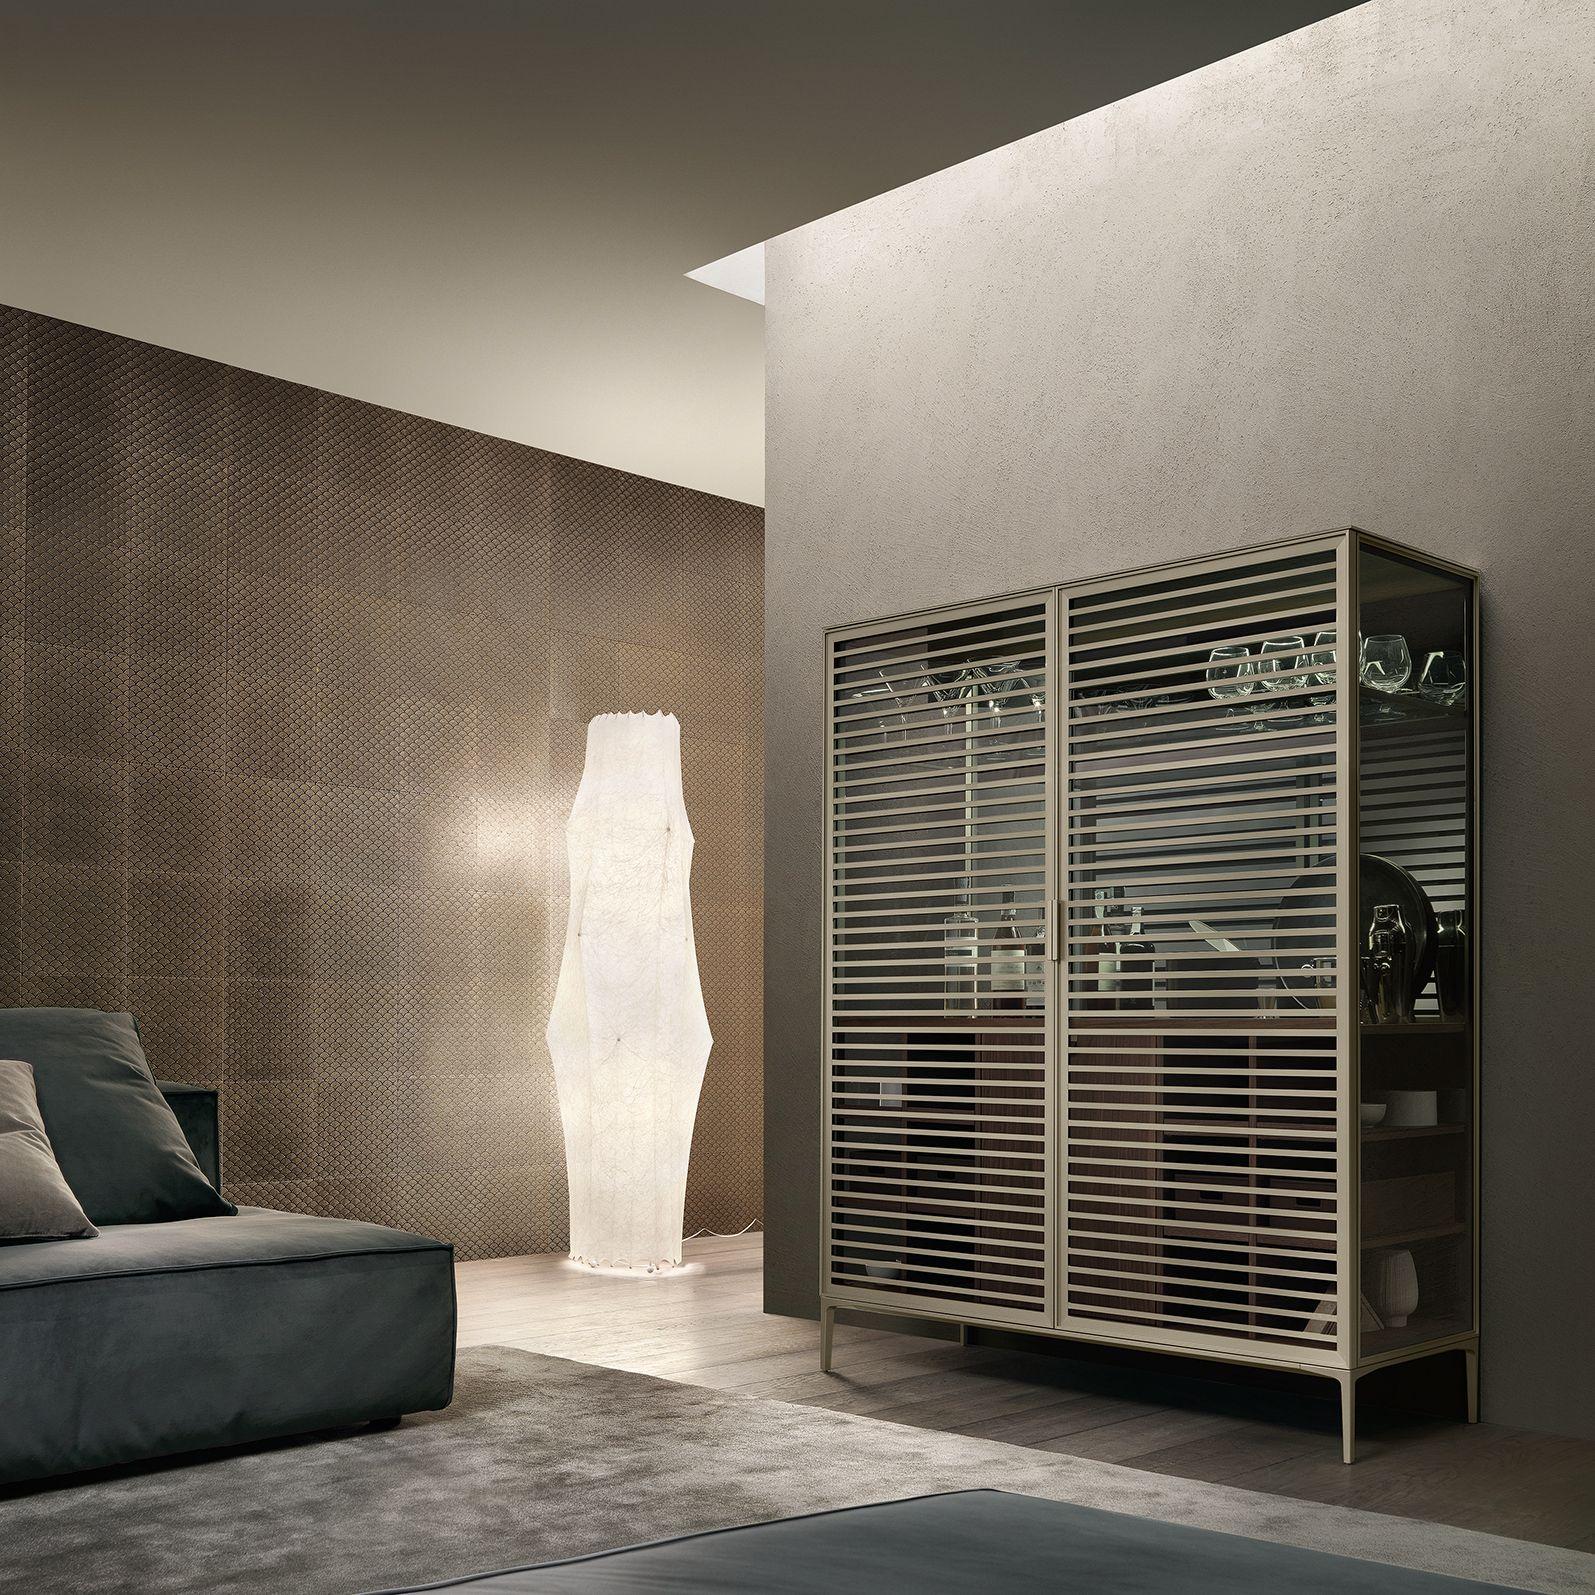 rimadesio wind bookcase in glass and alu rimadesio pinterest showroom and shelving